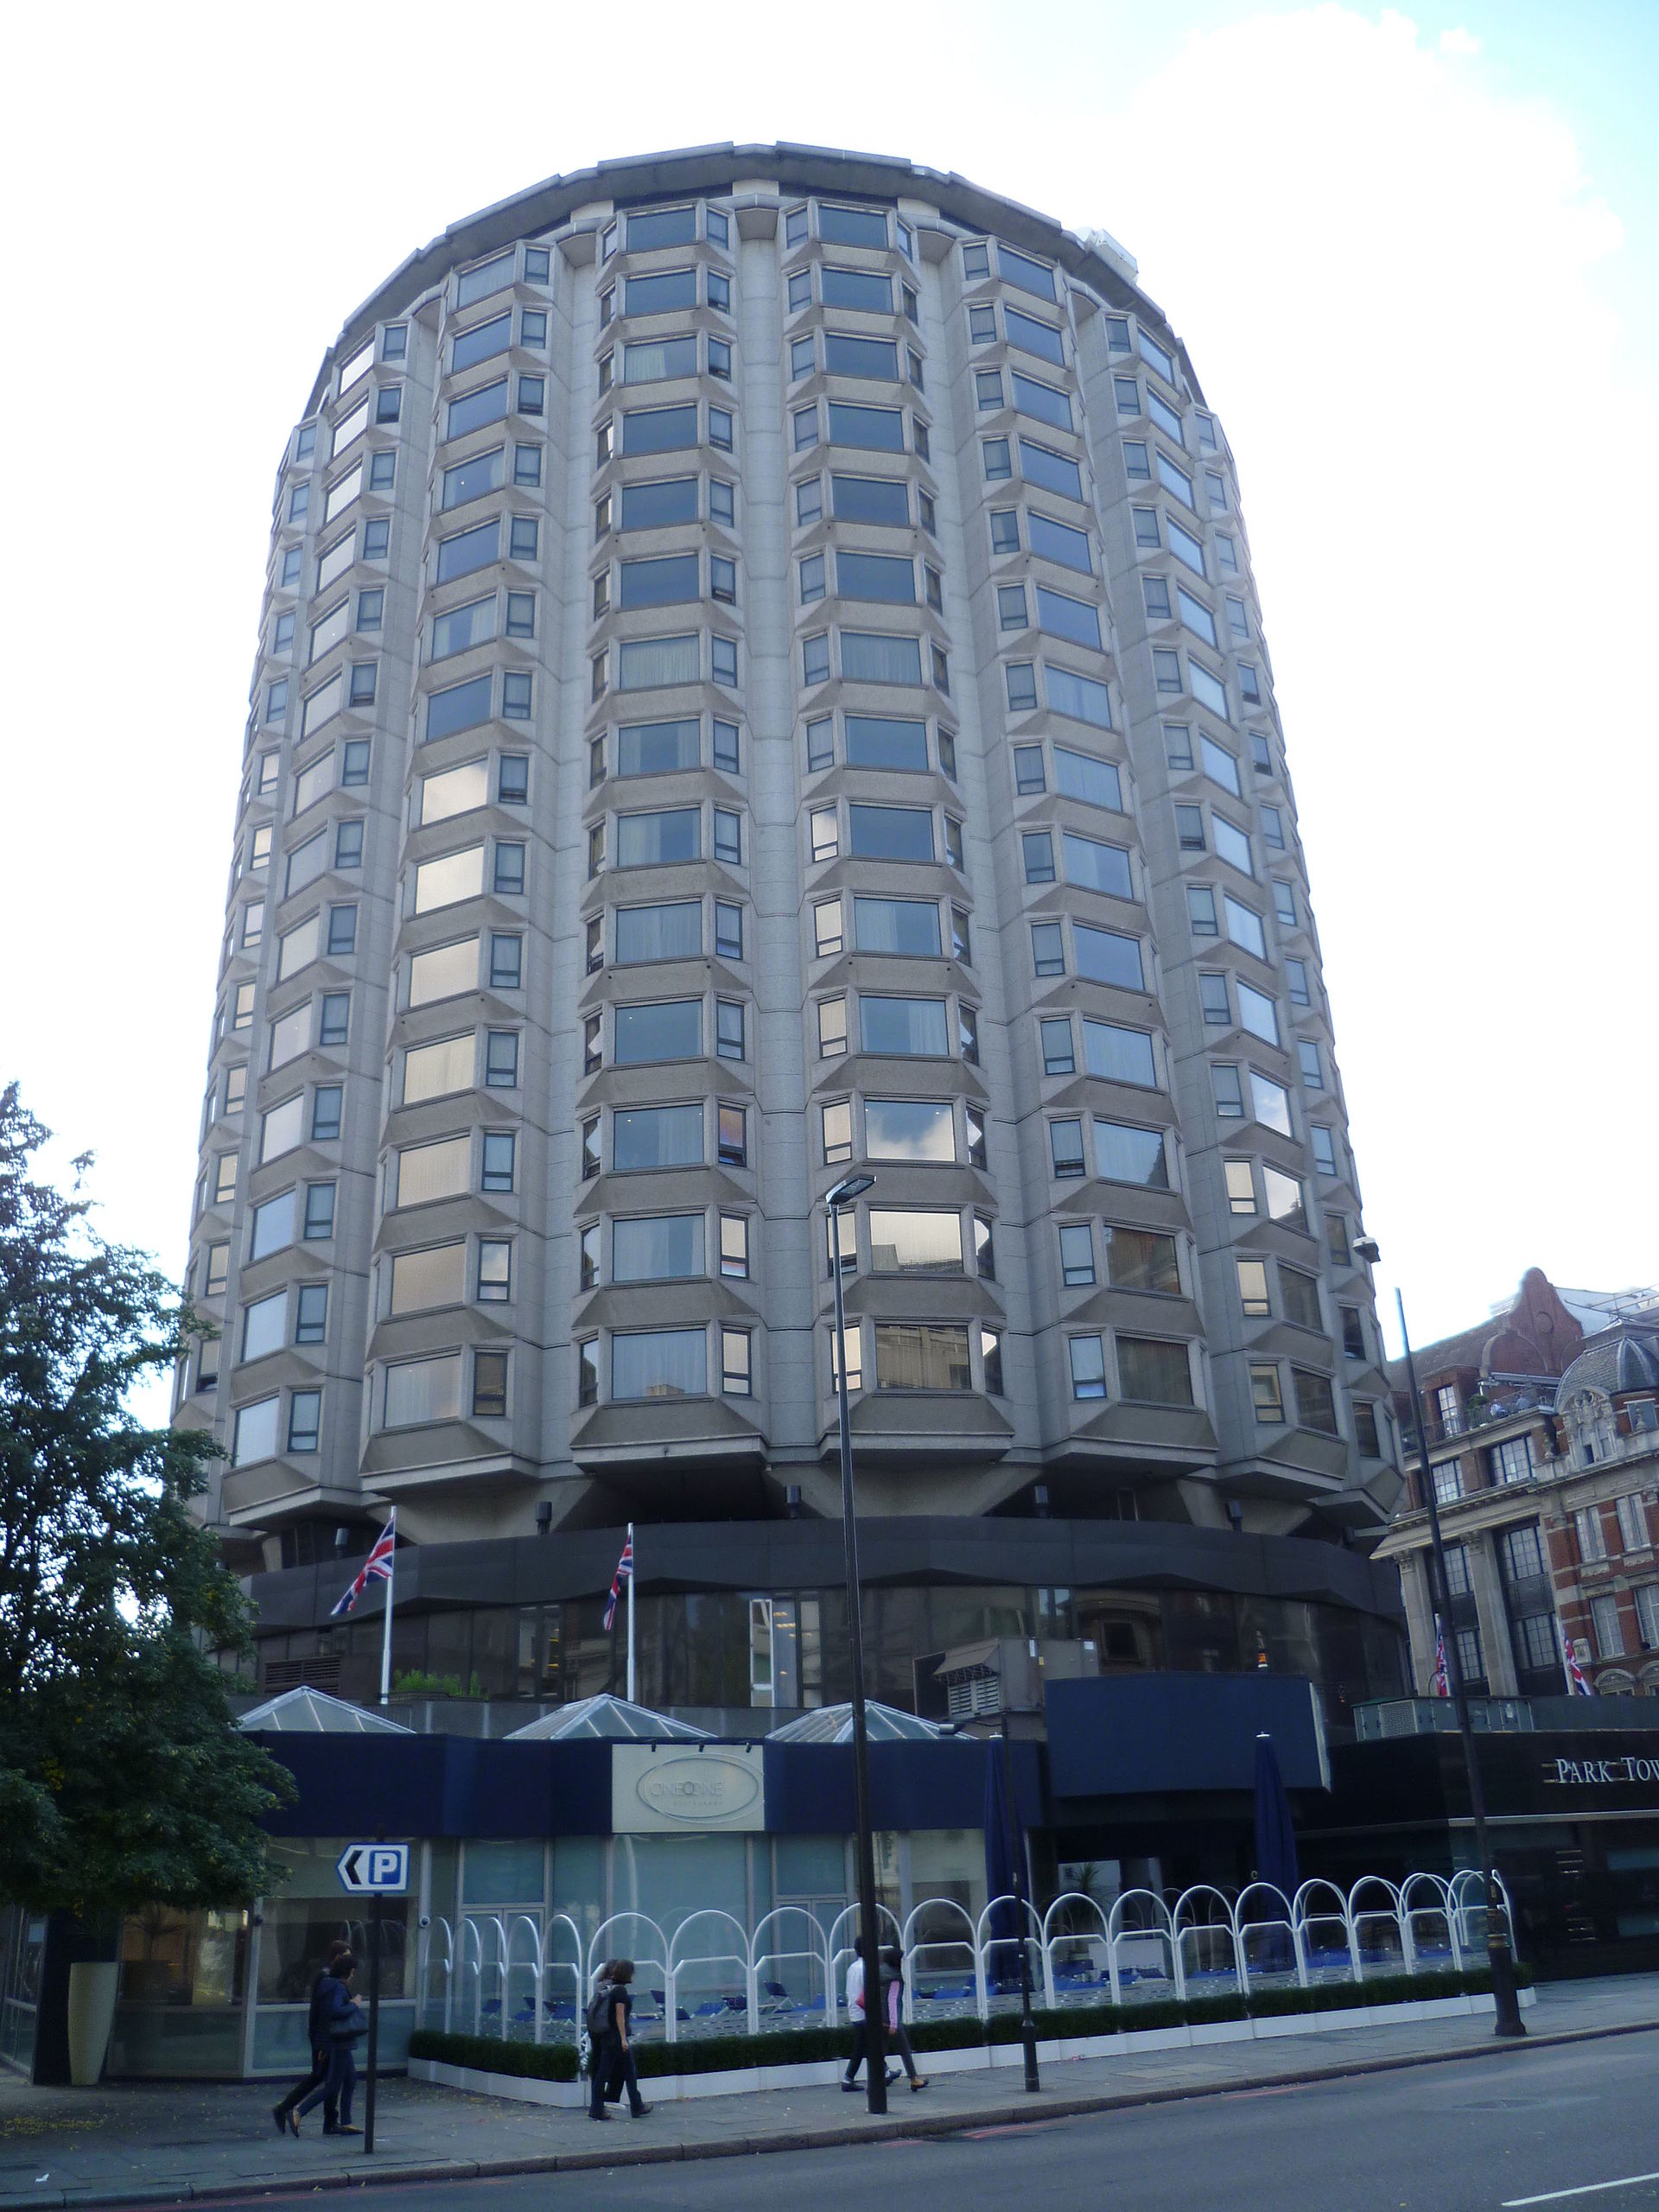 Kensington Park Hotel Ladbroke Grove